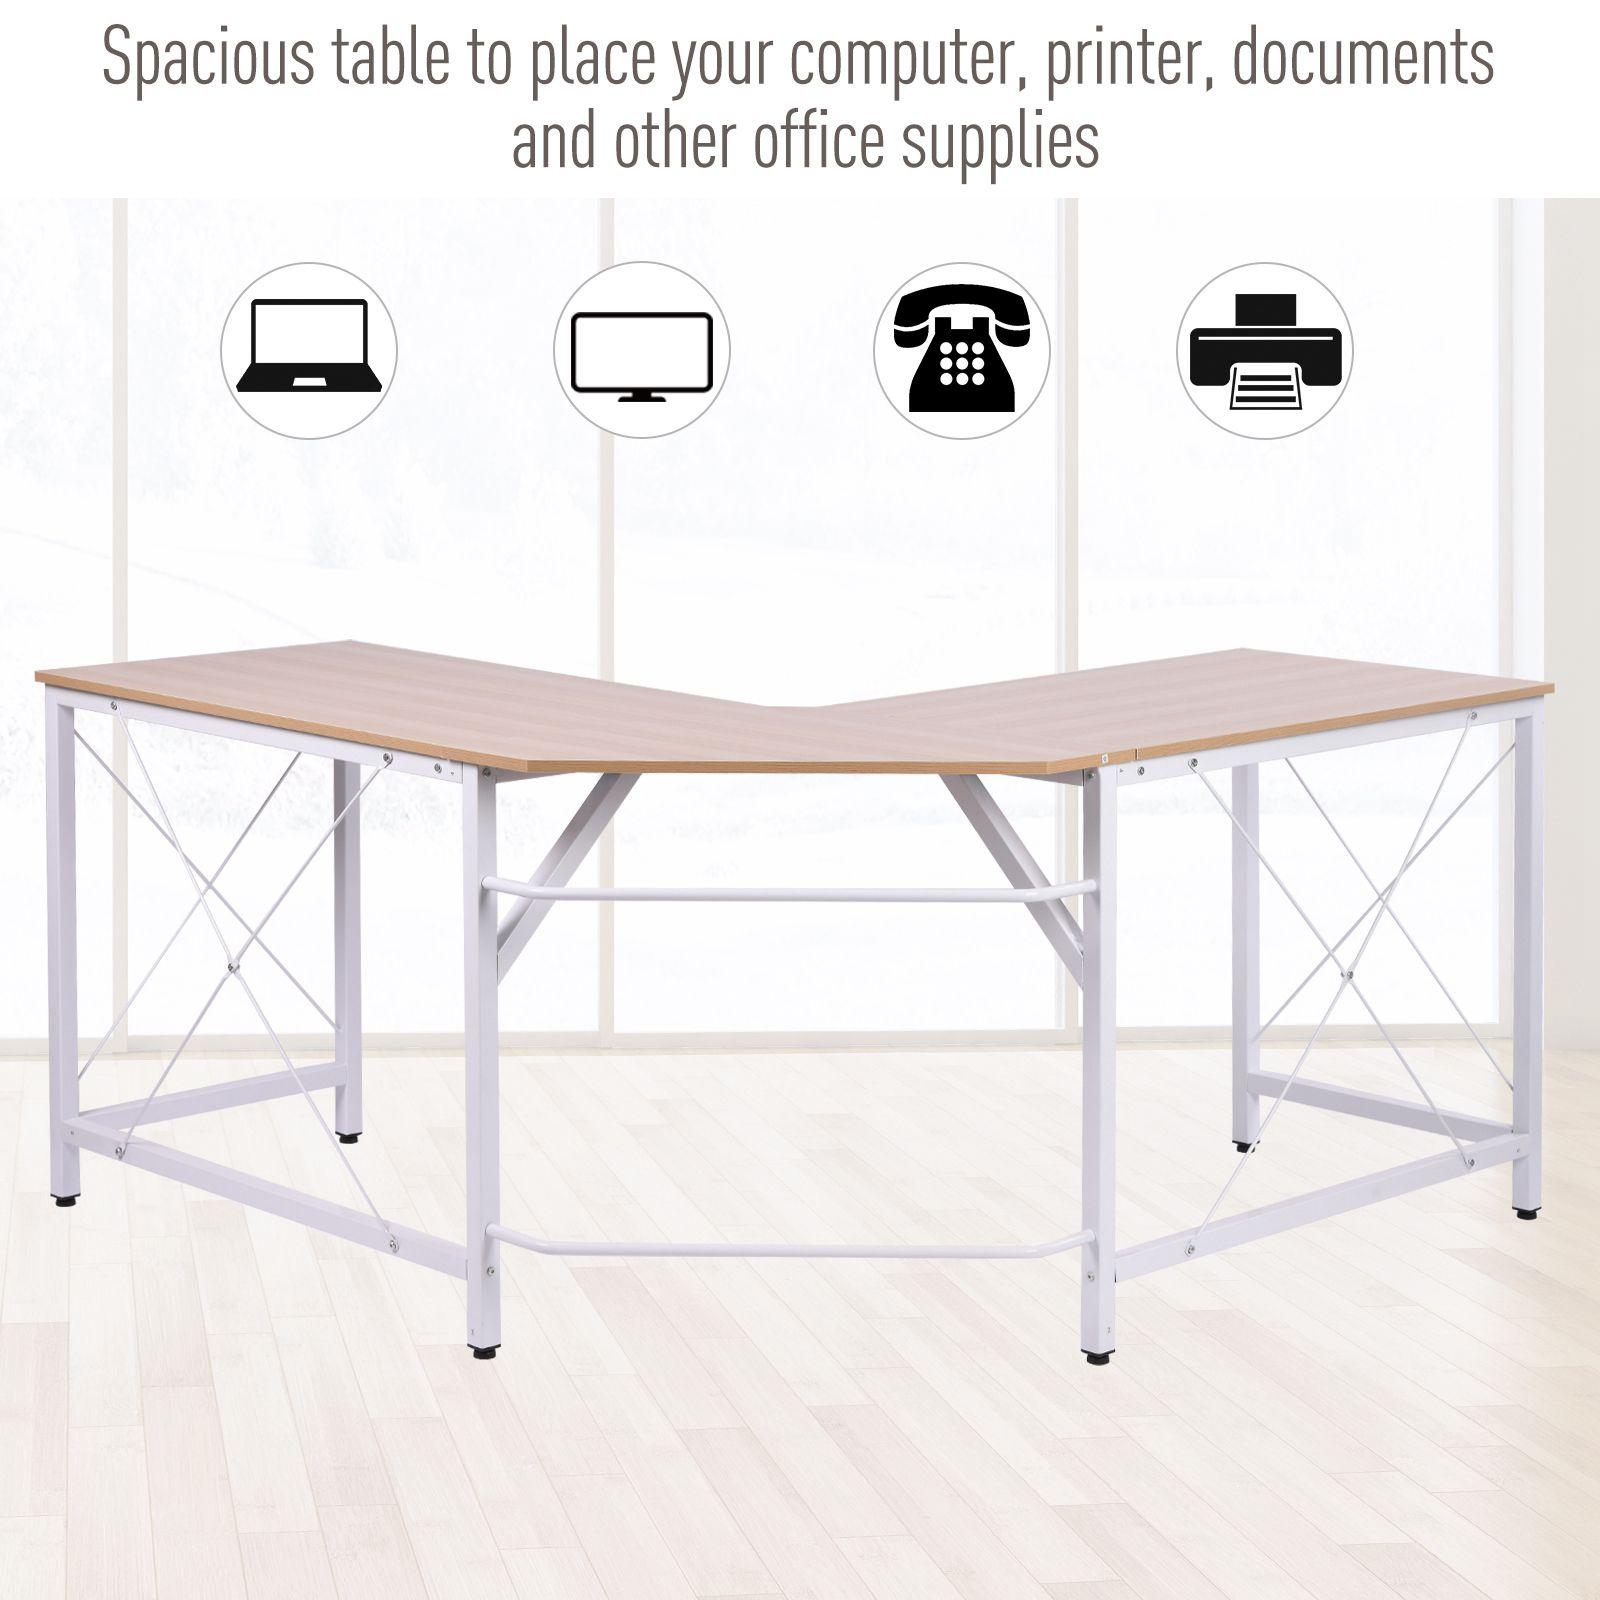 L-Shaped-Computer-Desk-Office-Wood-Corner-PC-Workstation-Large-Gaming-Desk-Table miniature 14